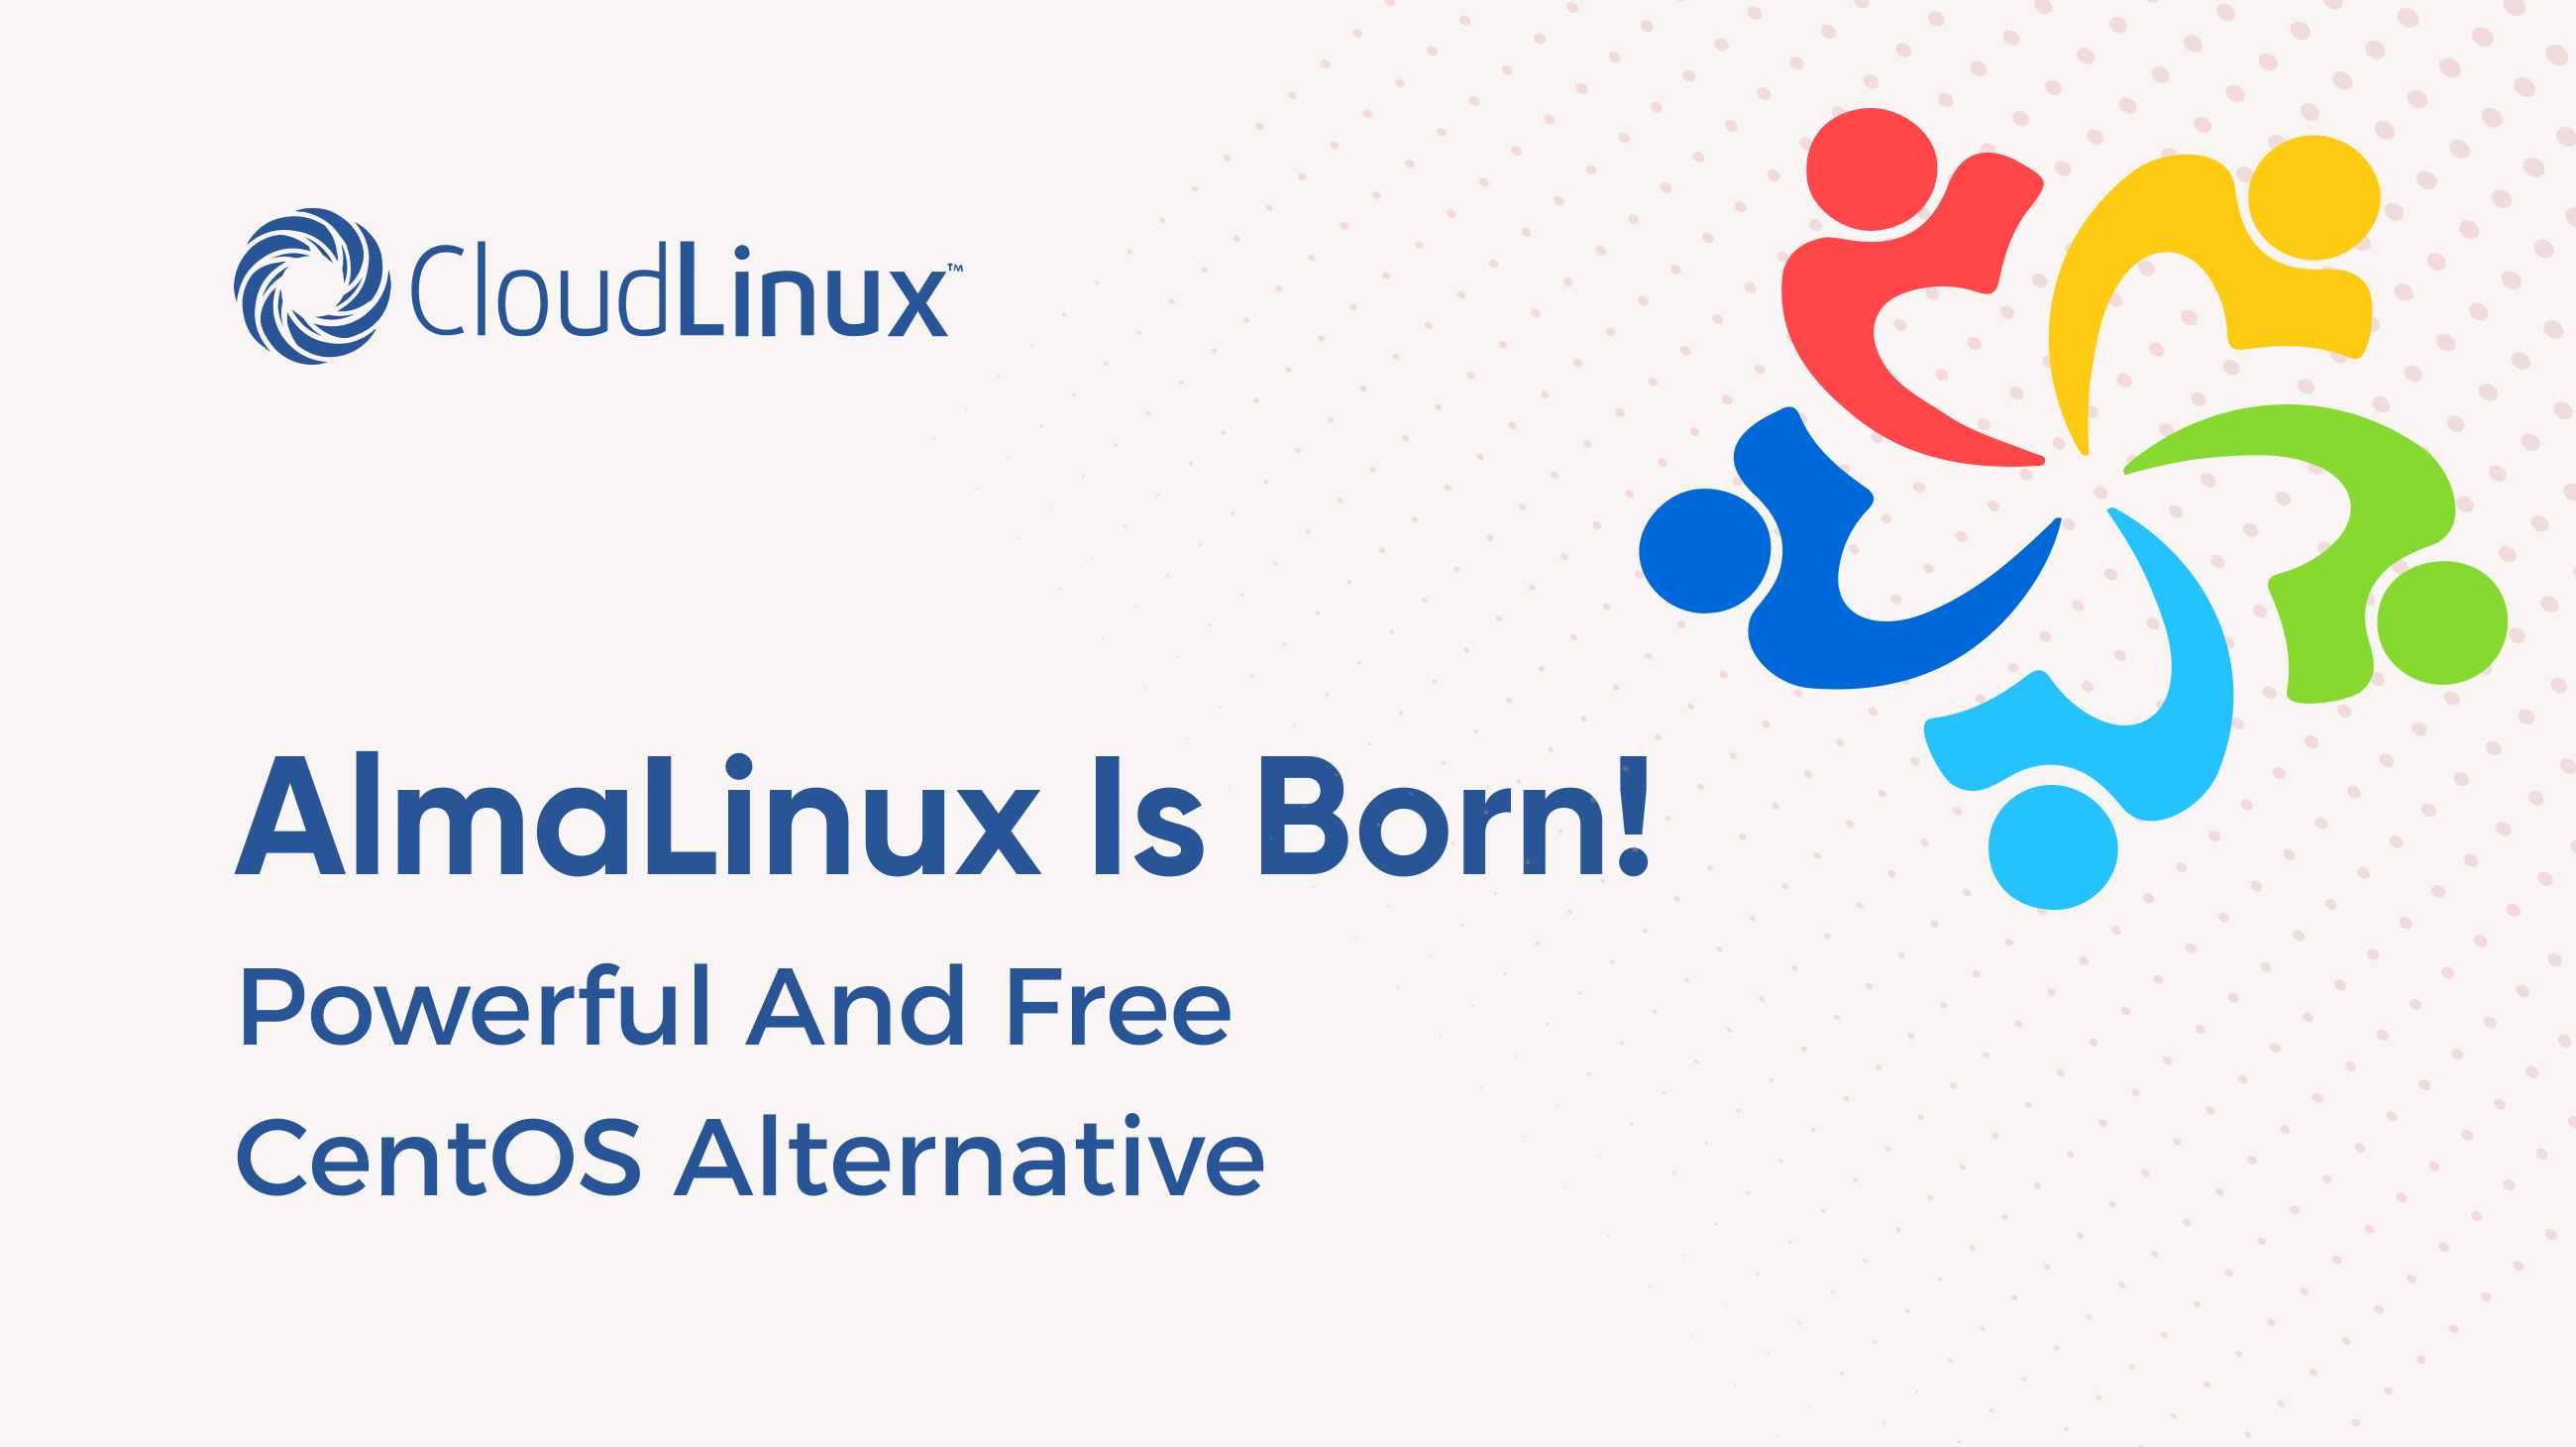 AlmaLinux is born! CentOS alternative